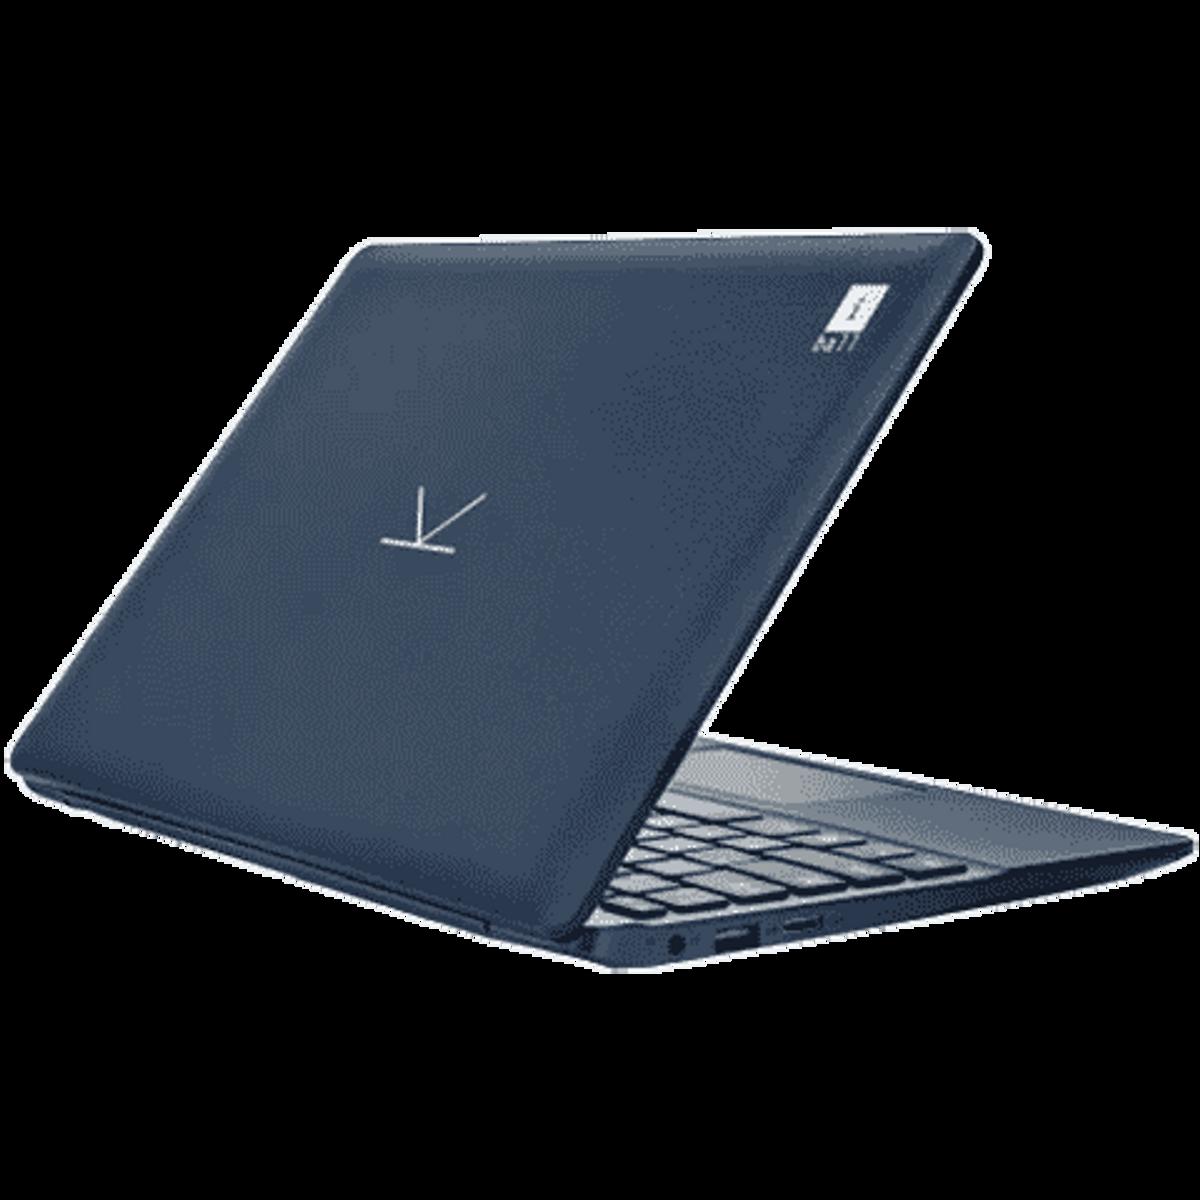 Iball Atom Quad Core - (2 GB/32 GB EMMC Storage/Windows 10 Home) CompBook Excelance (11.6 inch)